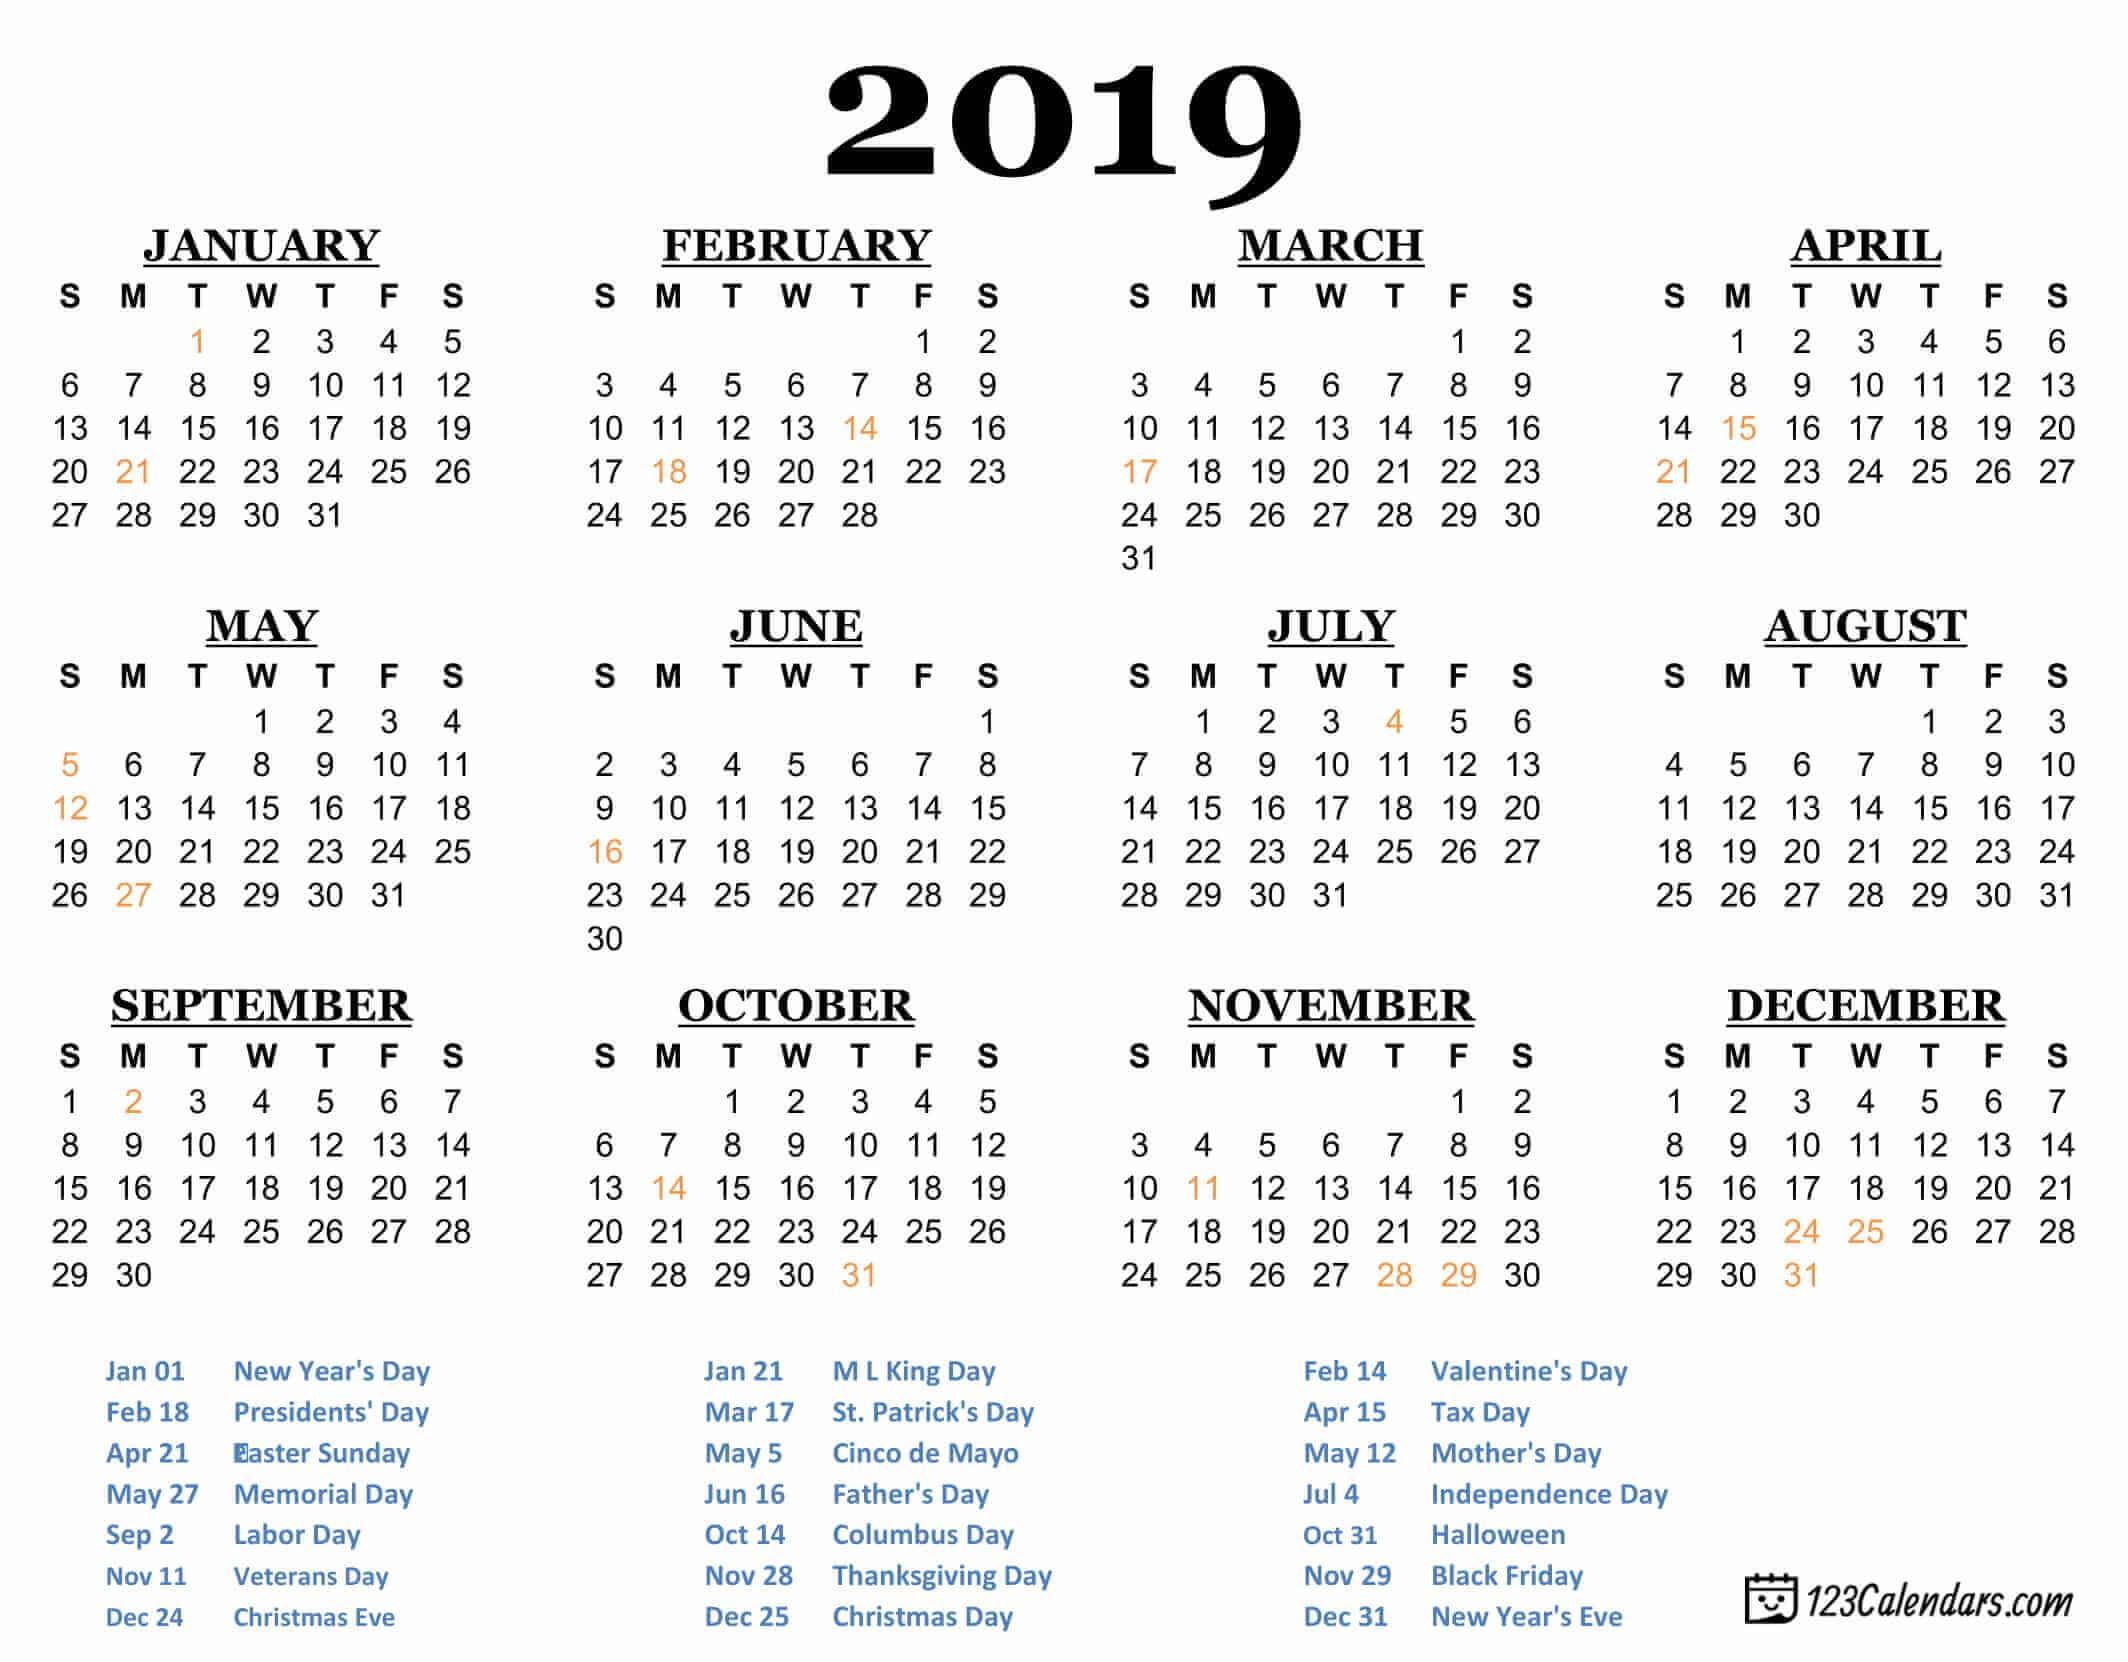 Printable Calendar with Holidays 2019 Free Printable 2019 Calendar